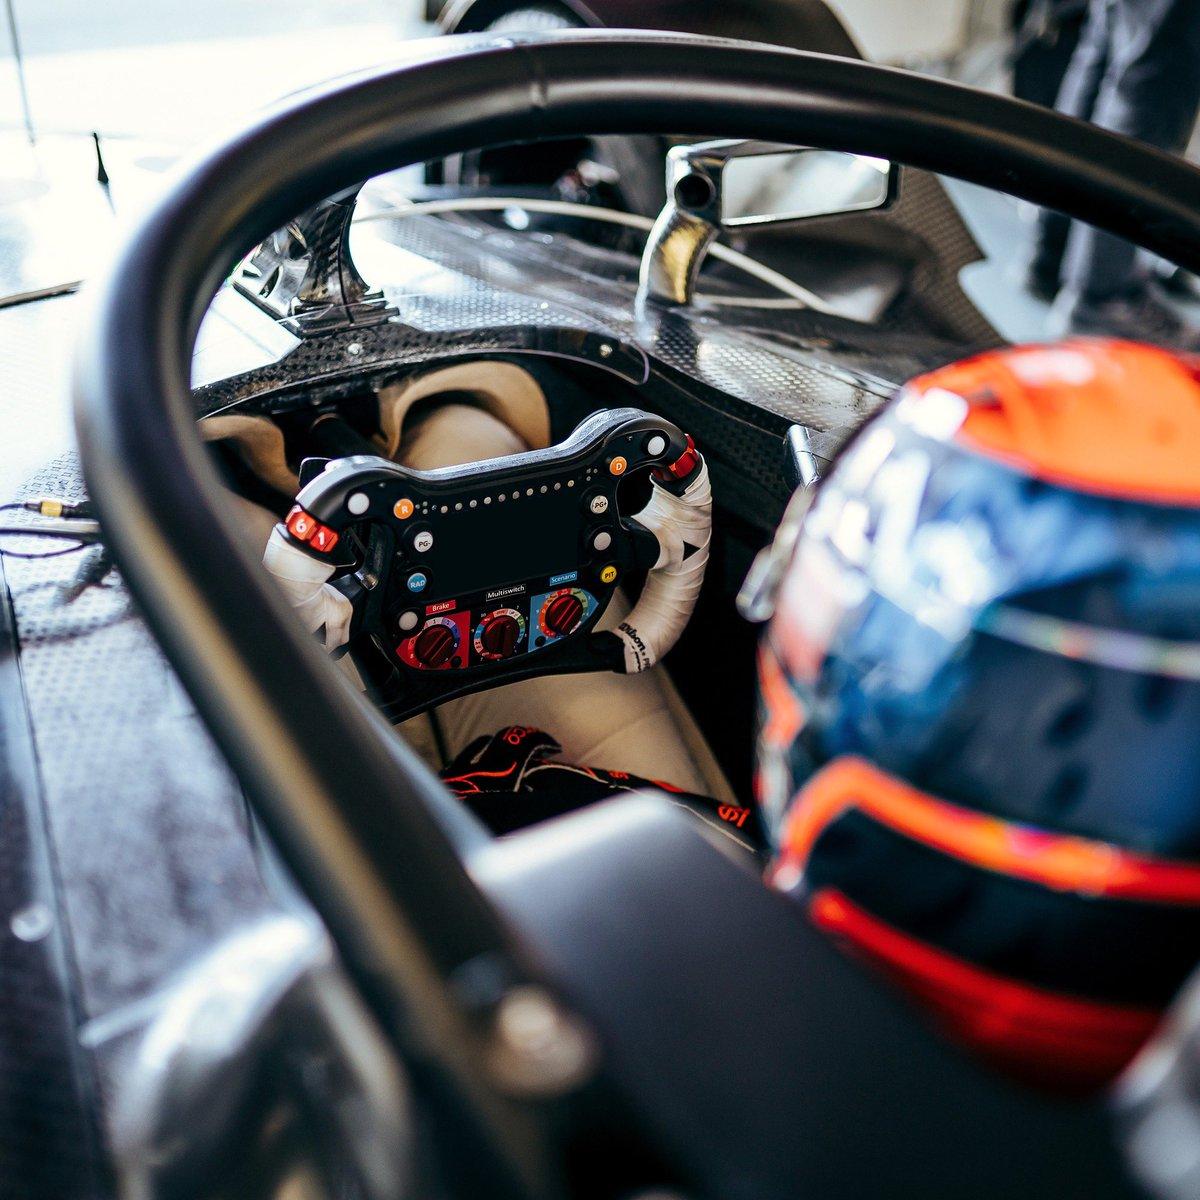 Tag someone who would love to drive the @MercedesBenz EQ Silver Arrow 01.  #FormulaESoonHasAMercedes #poweredbyEQ #ABBFormulaE <br>http://pic.twitter.com/NkYm5u8CrO